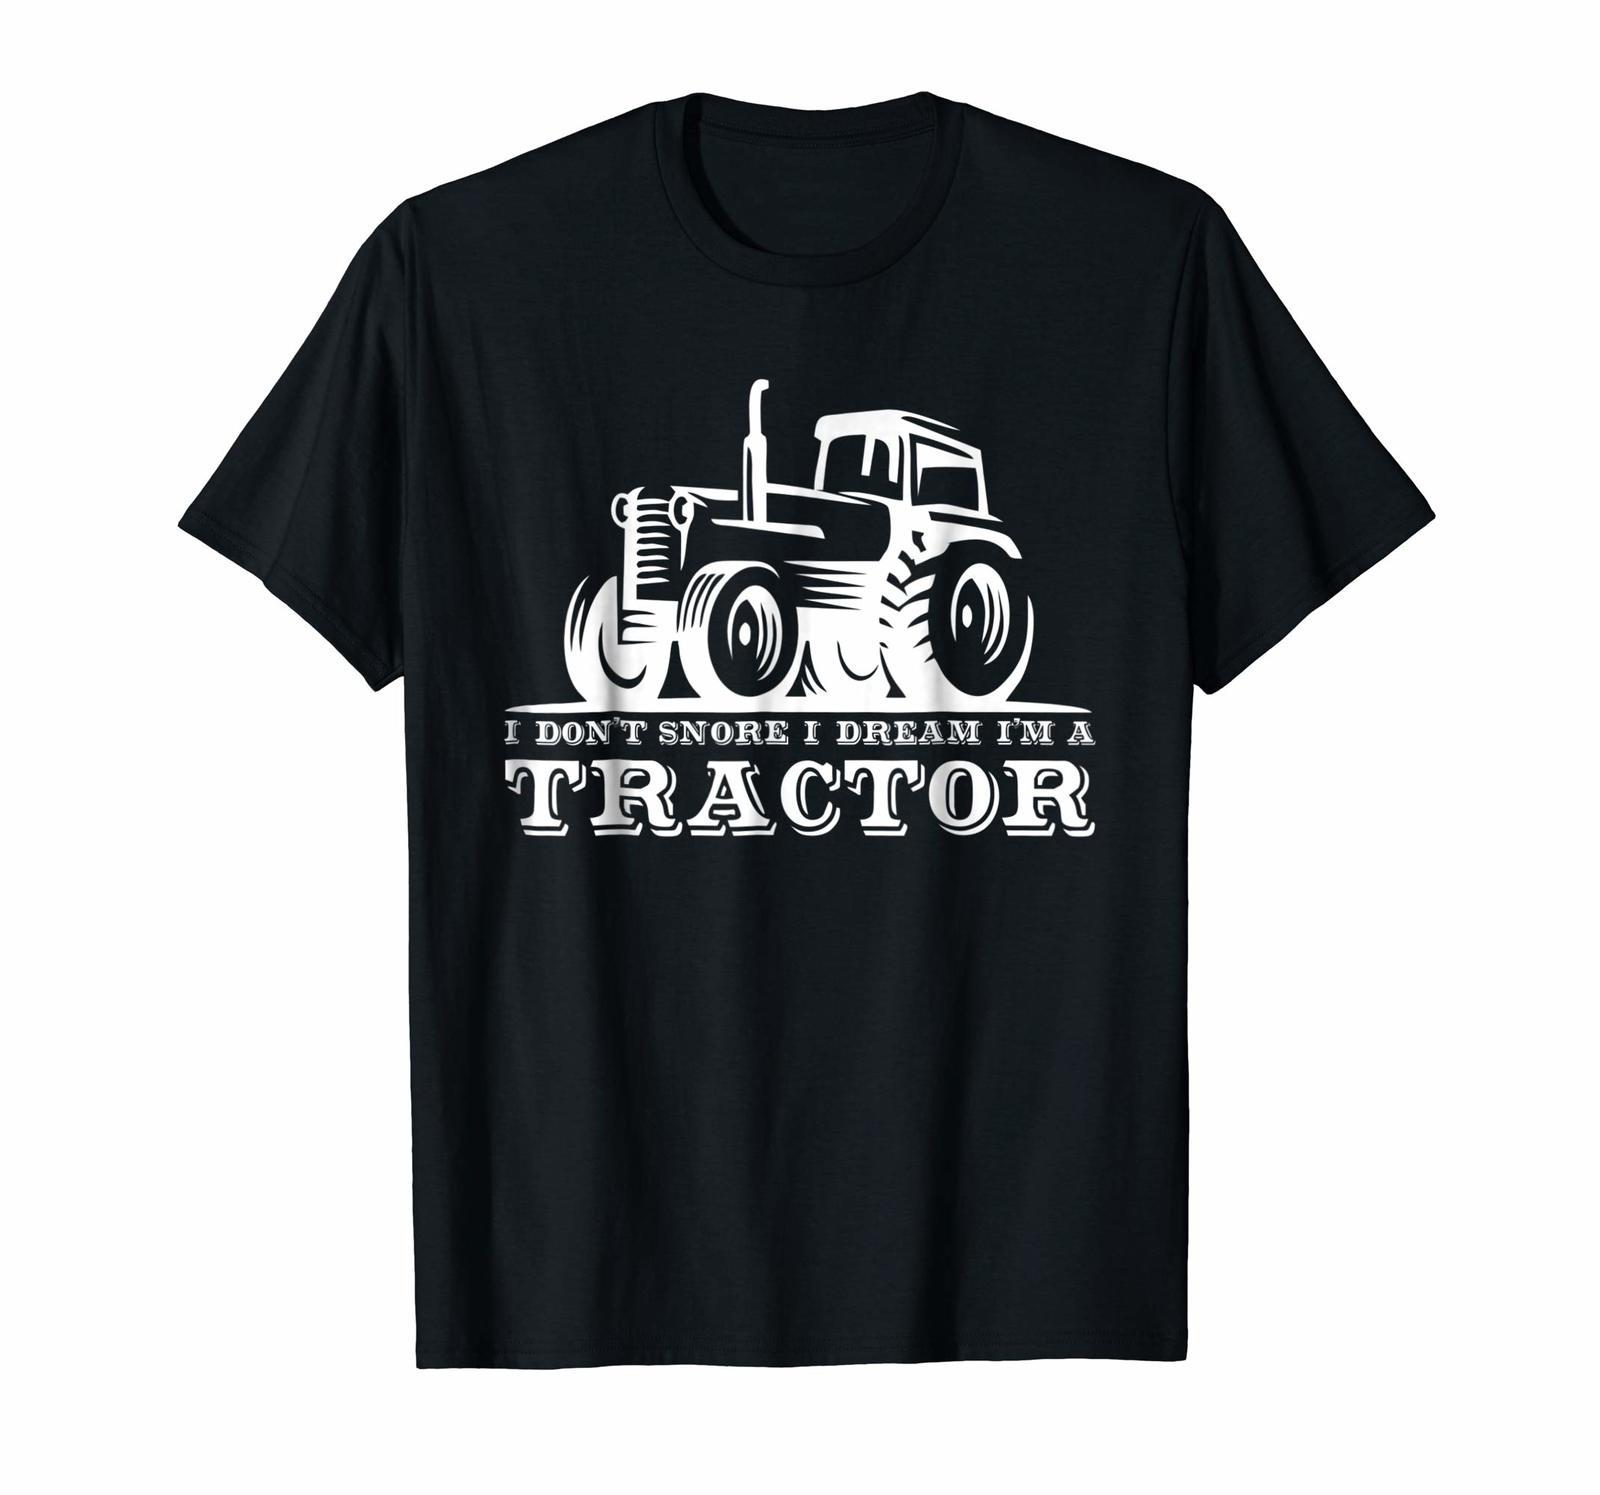 Brother Shirts - Funny I Don't Snore I Dream I'm A Tractor T-Shirt Men